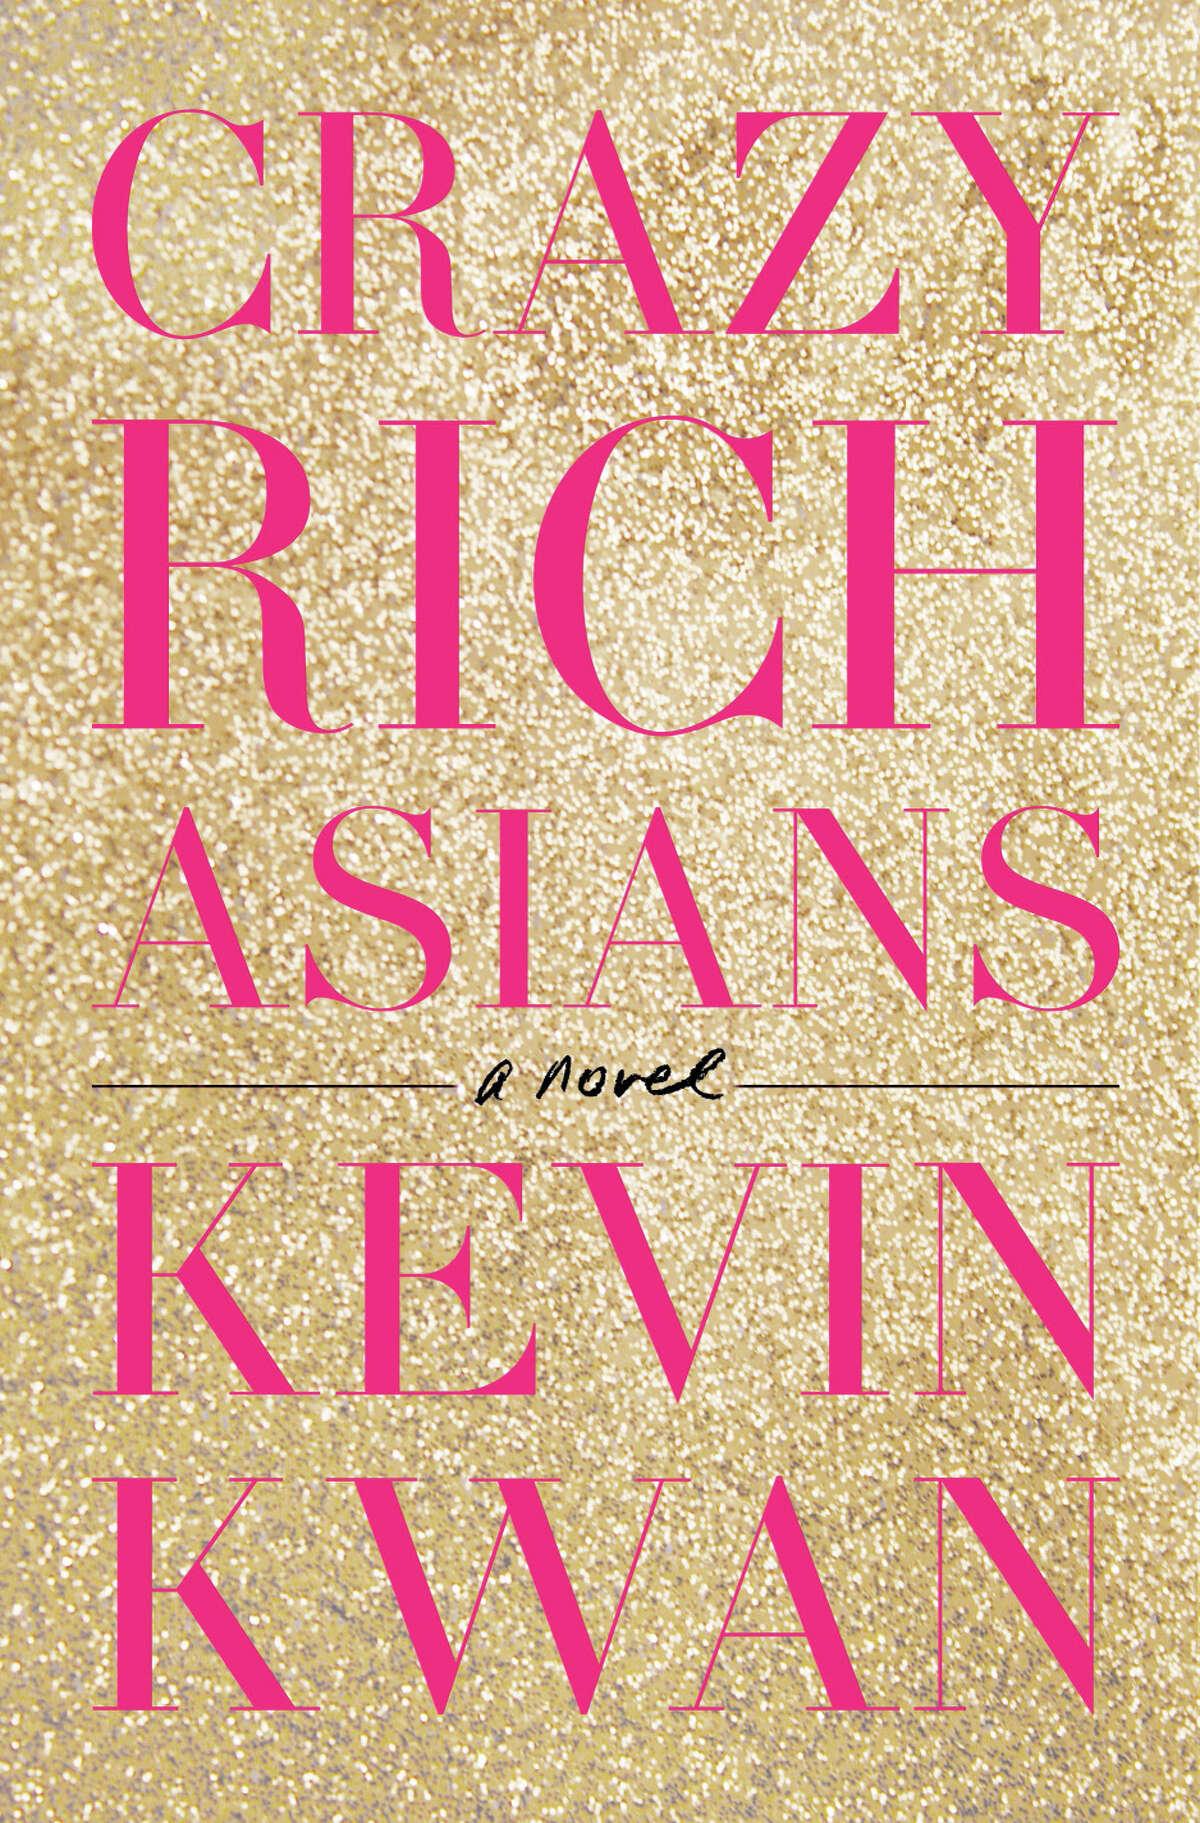 Hardcover Kwan's debut novel.